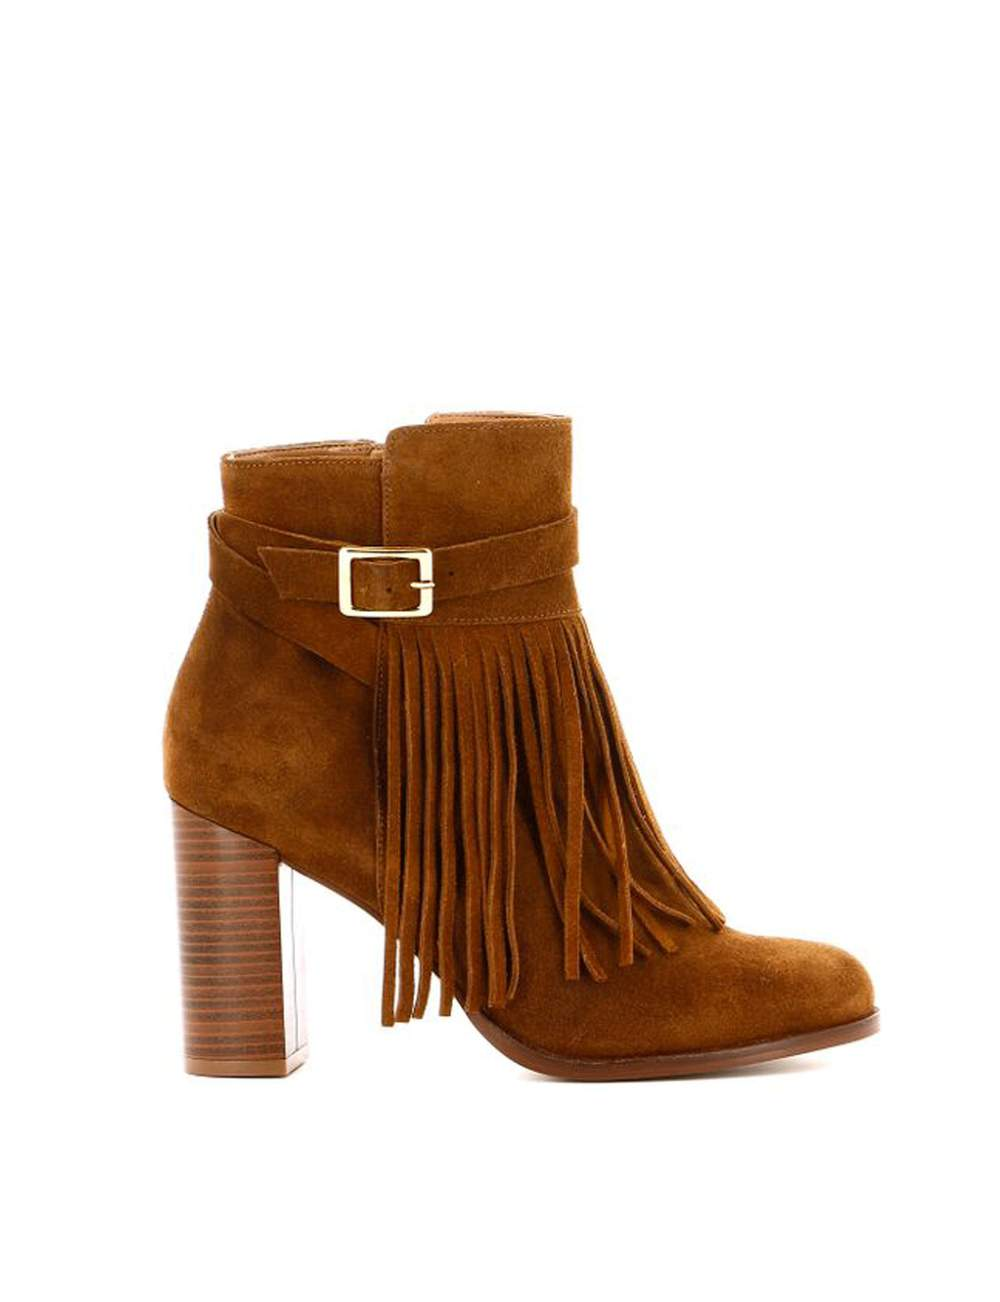 La boots frangée